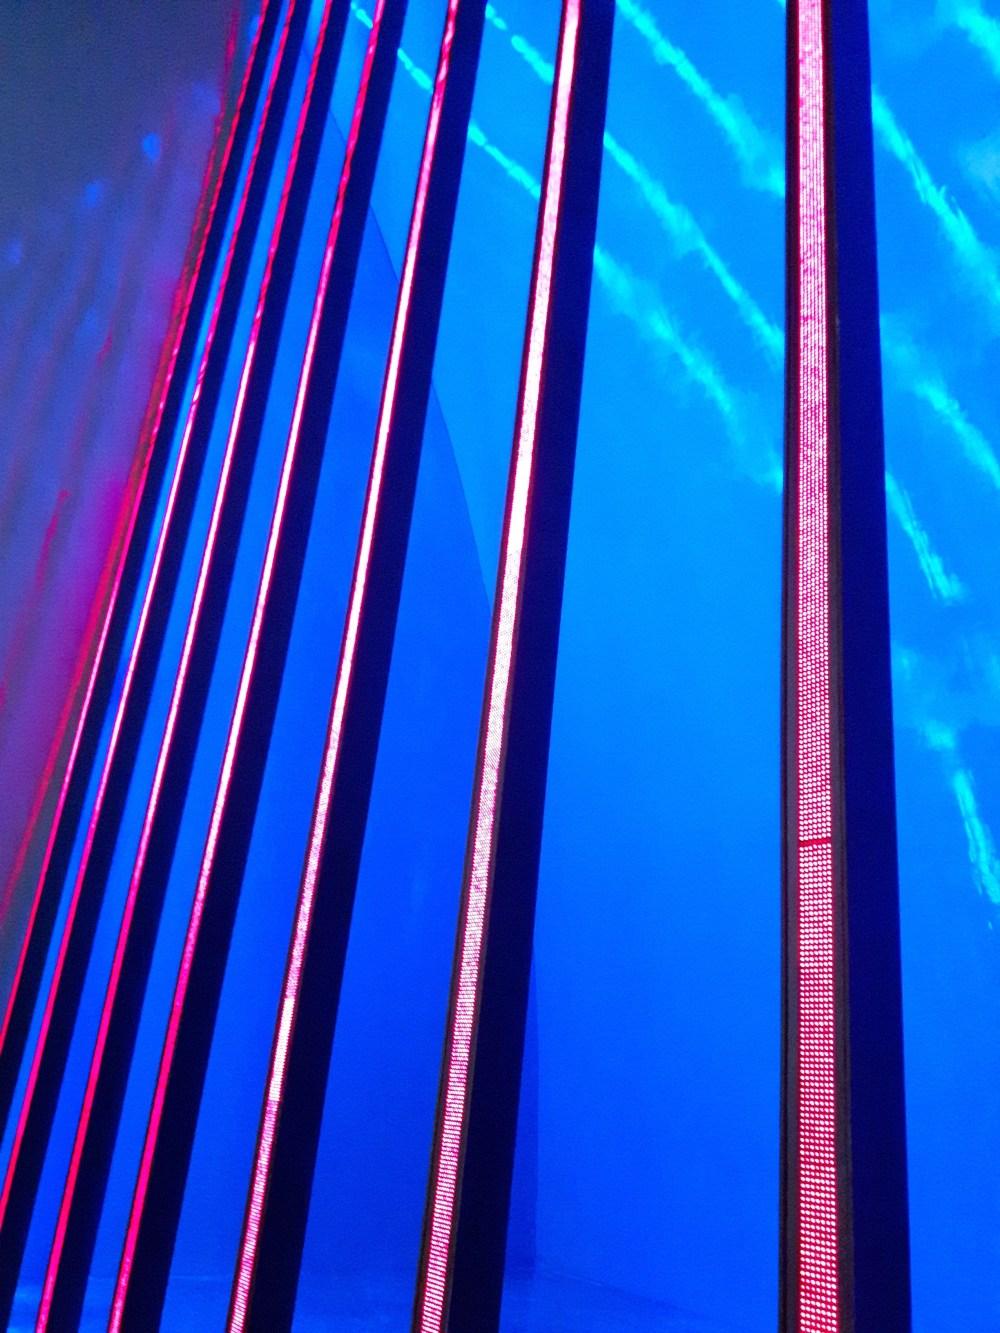 Le mur diodes lumineuses de Jenny Holzer